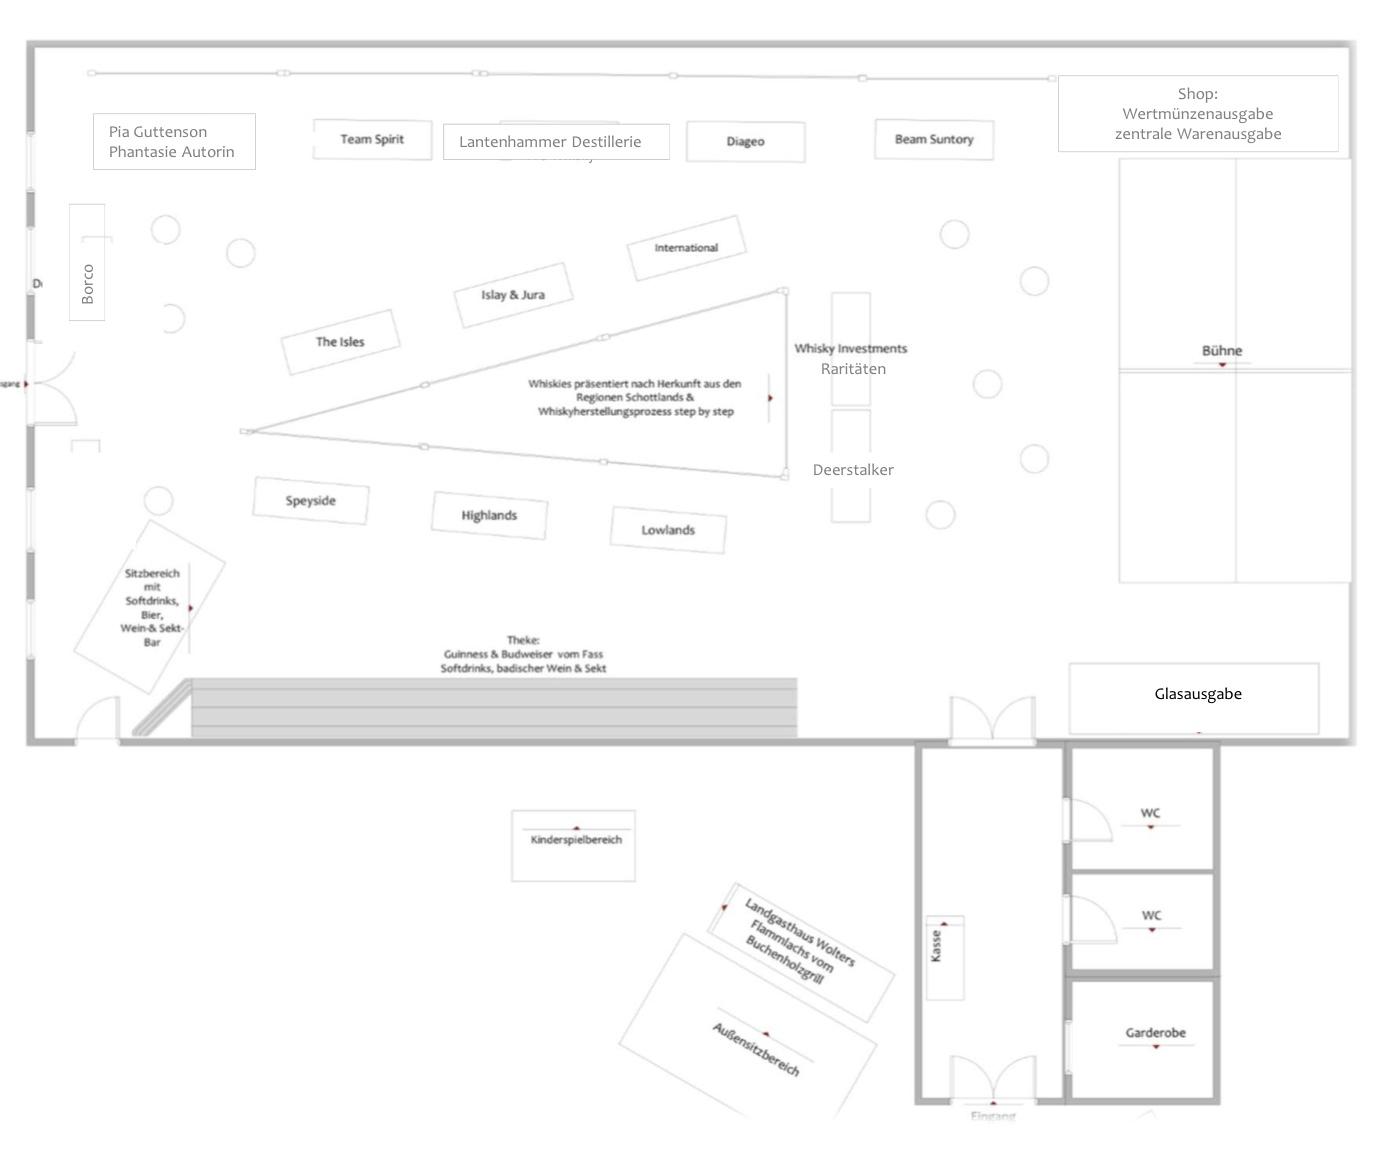 Hallenplan-whiskyfair